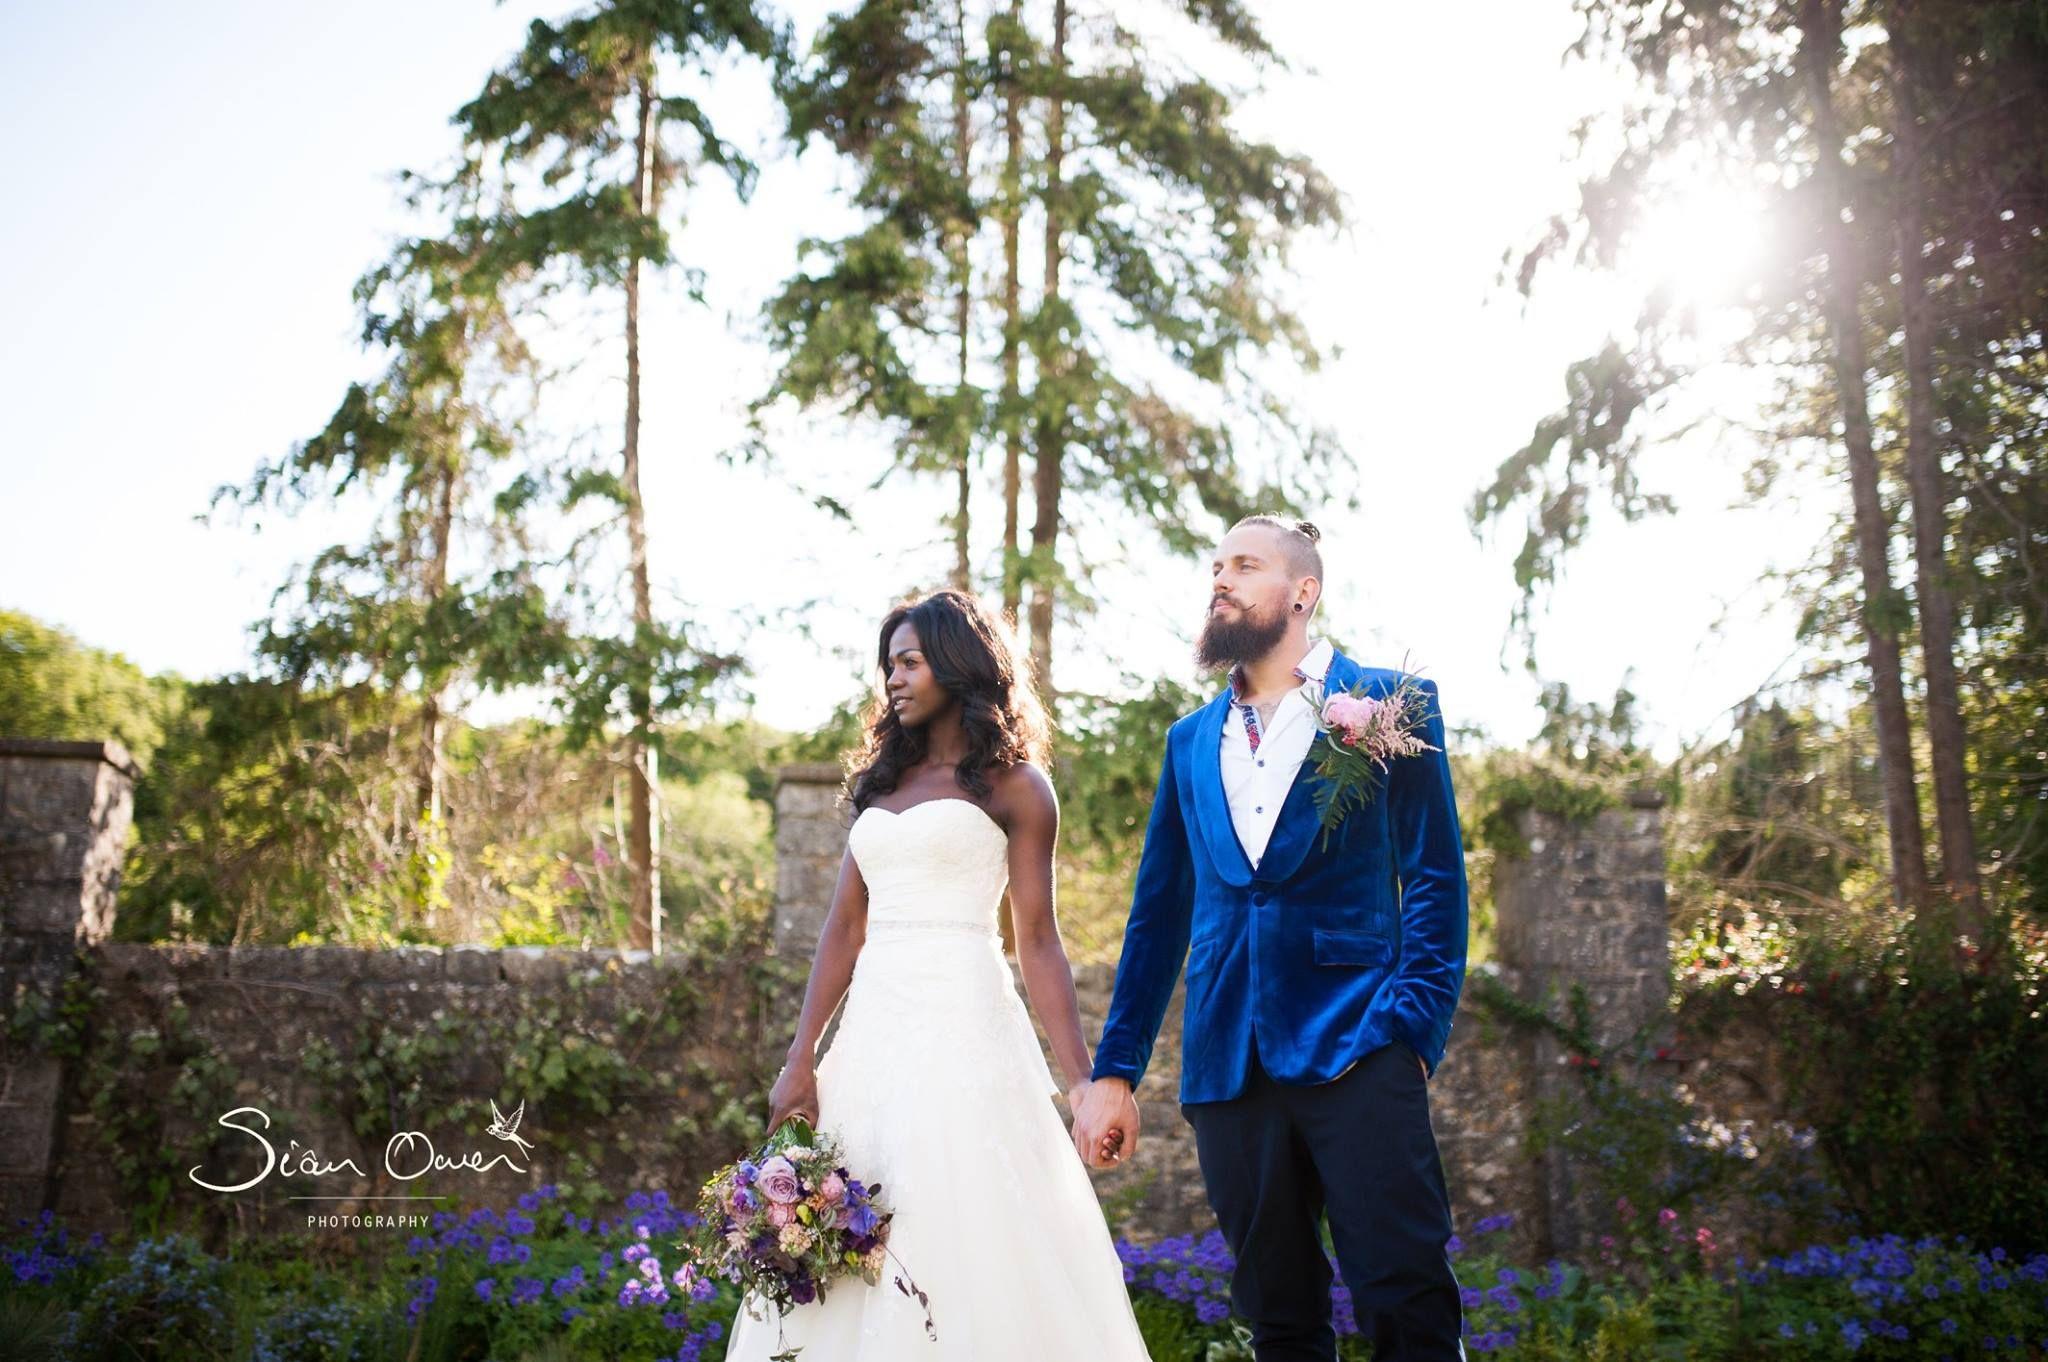 Sian owen photography style shoot blue garden at st donatus